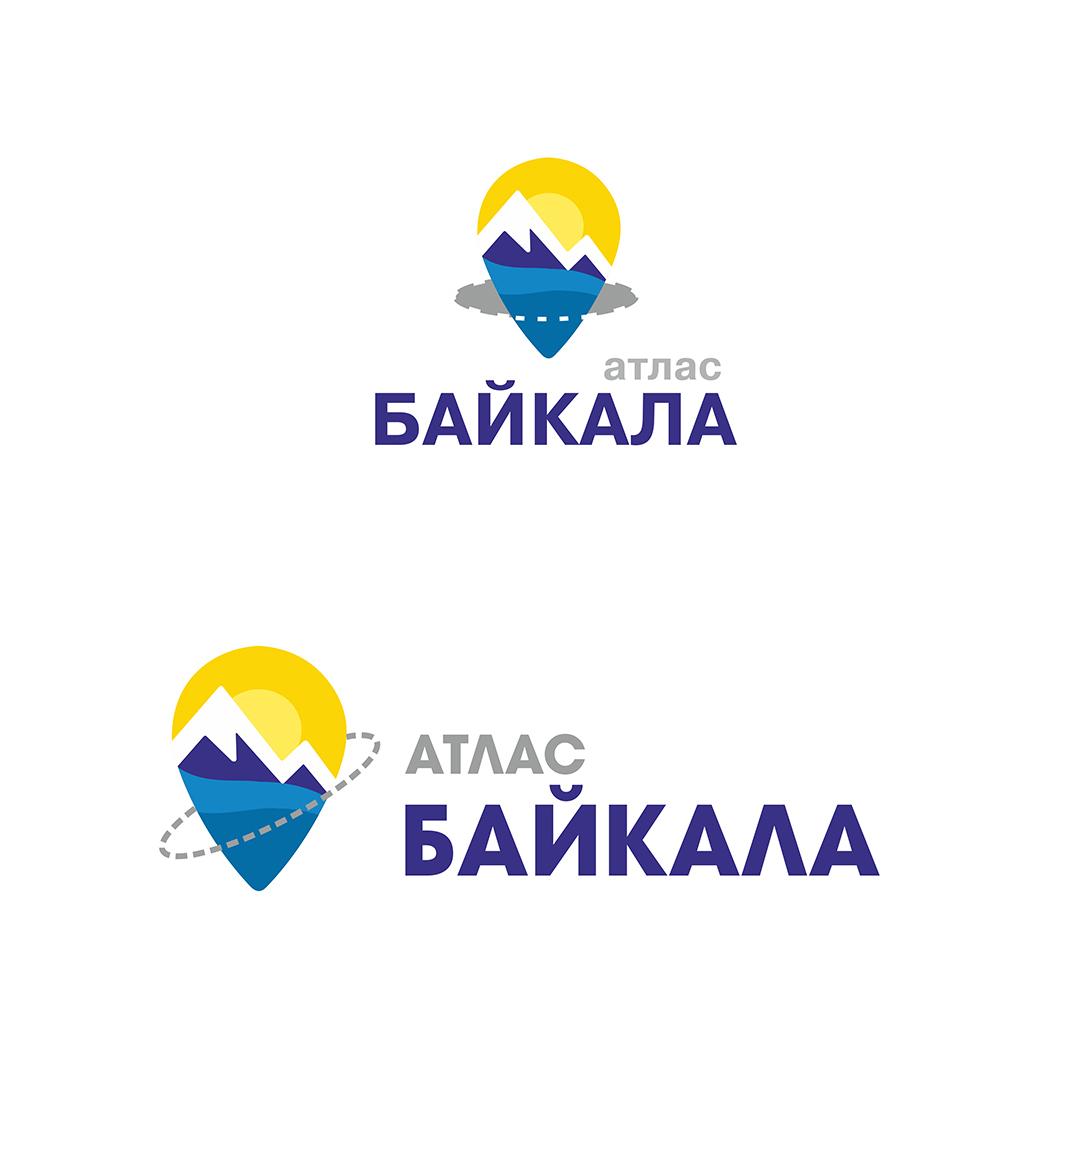 Разработка логотипа Атлас Байкала фото f_4045b0fe9da7ab05.jpg